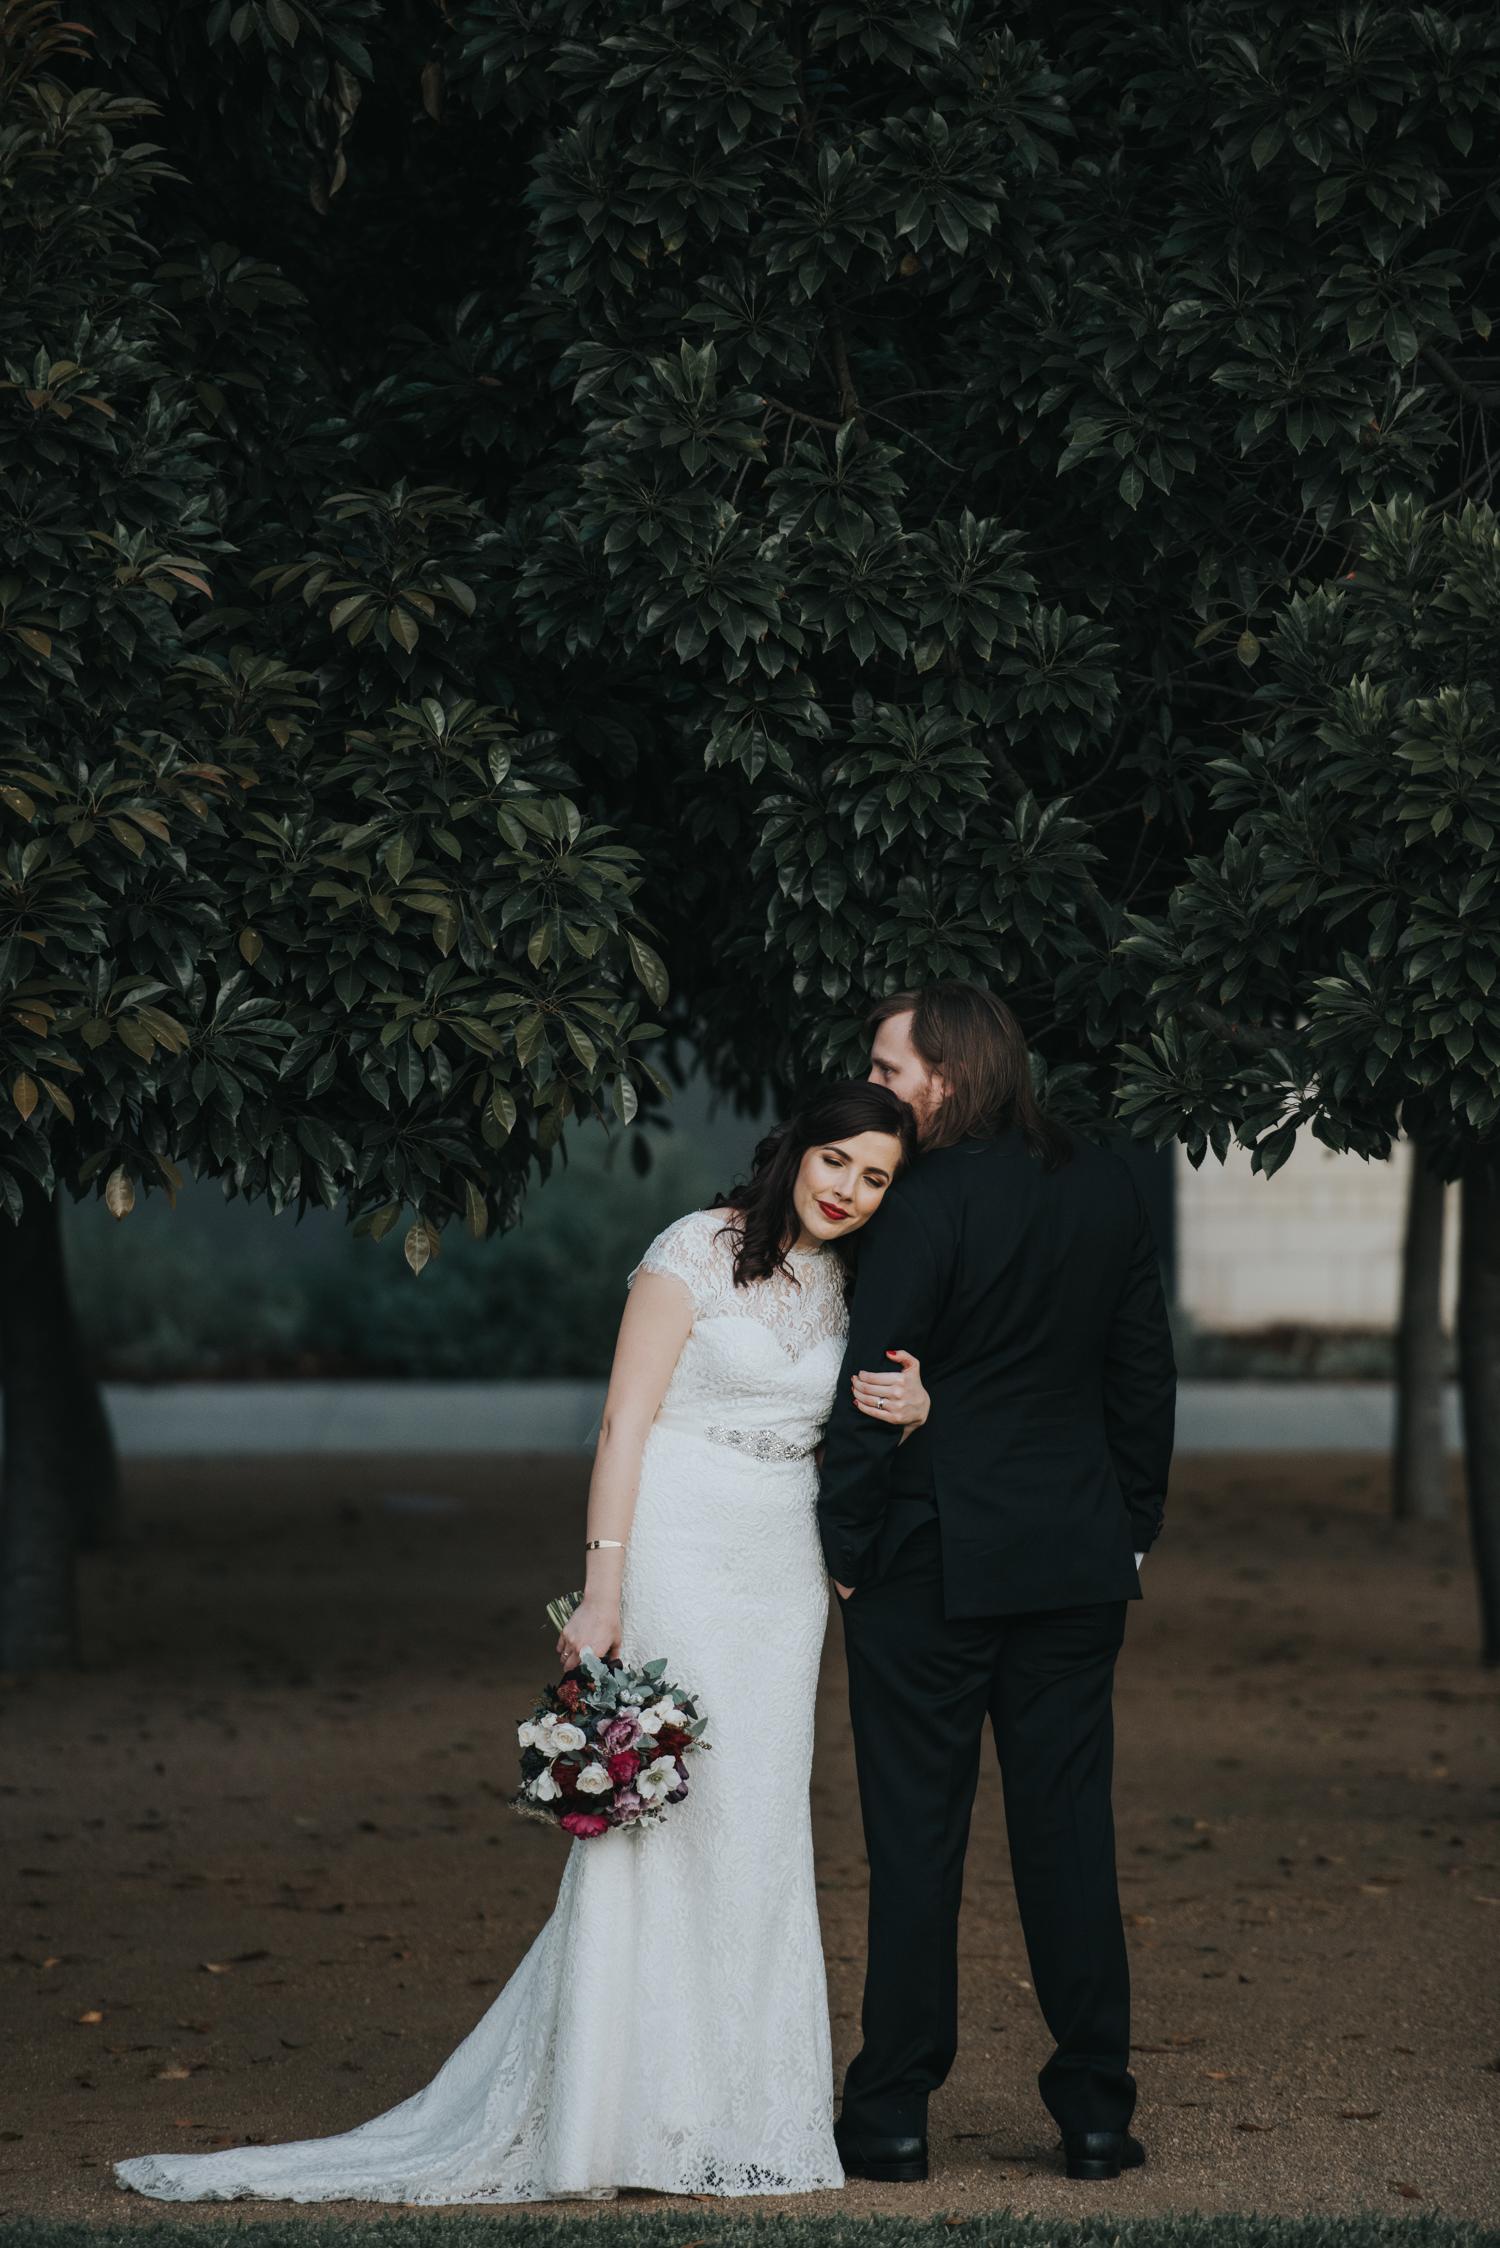 Brisbane Wedding Photographer | Elopement-Engagement Photographer-37.jpg